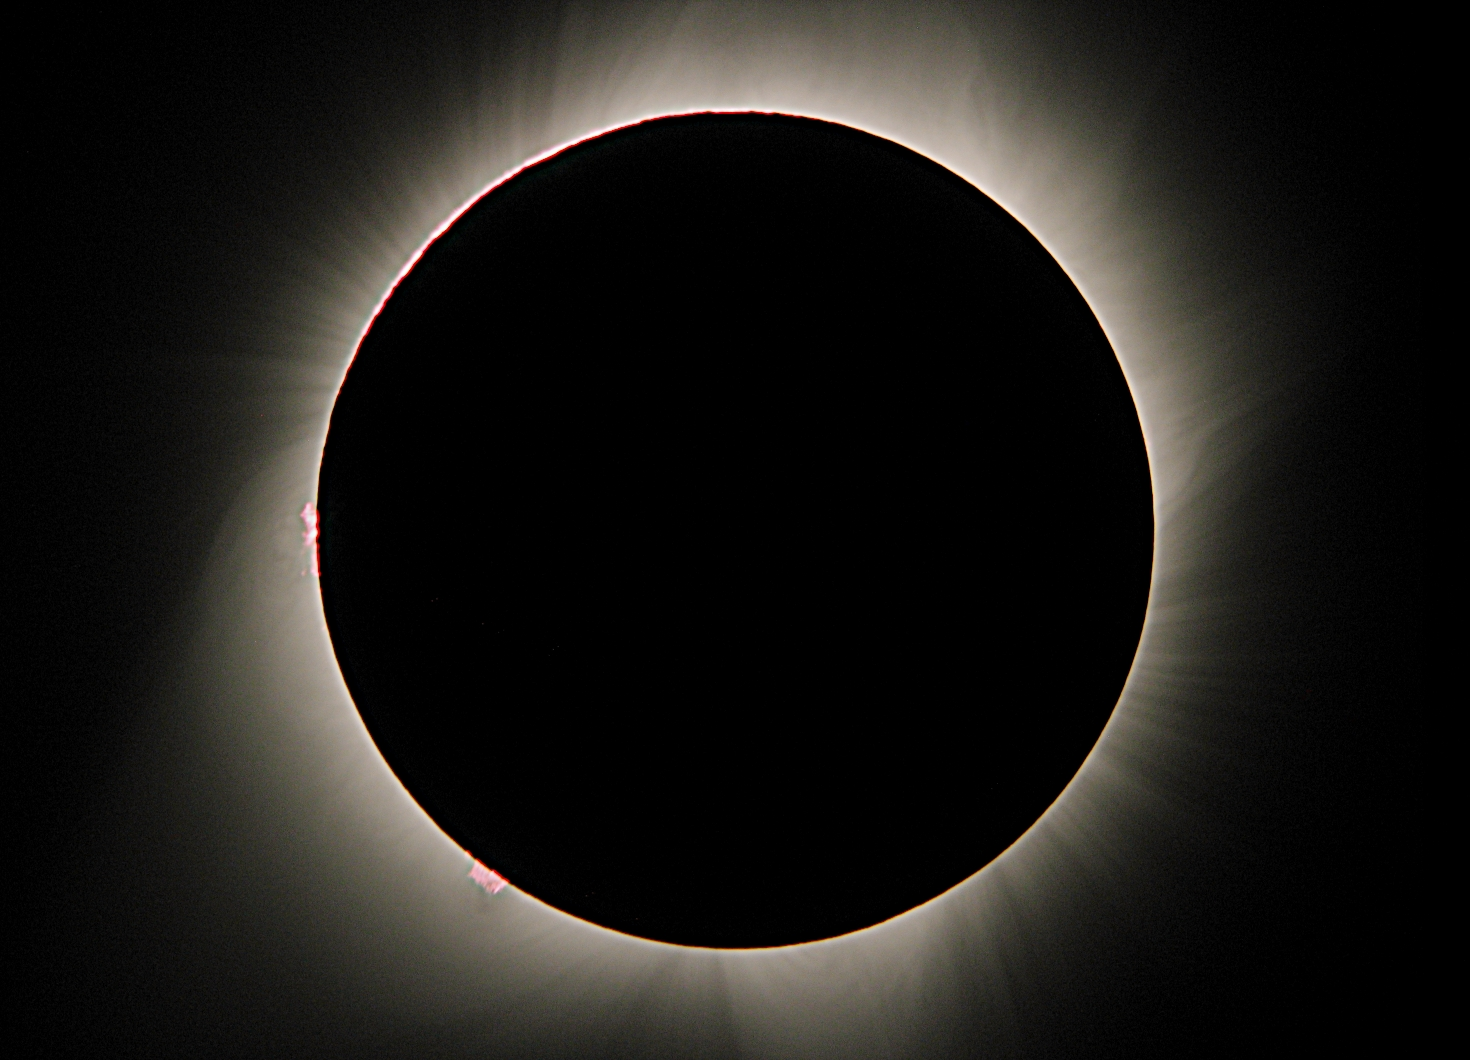 eclipse210817-17h21m16-330mmf3bmfddp3.jp